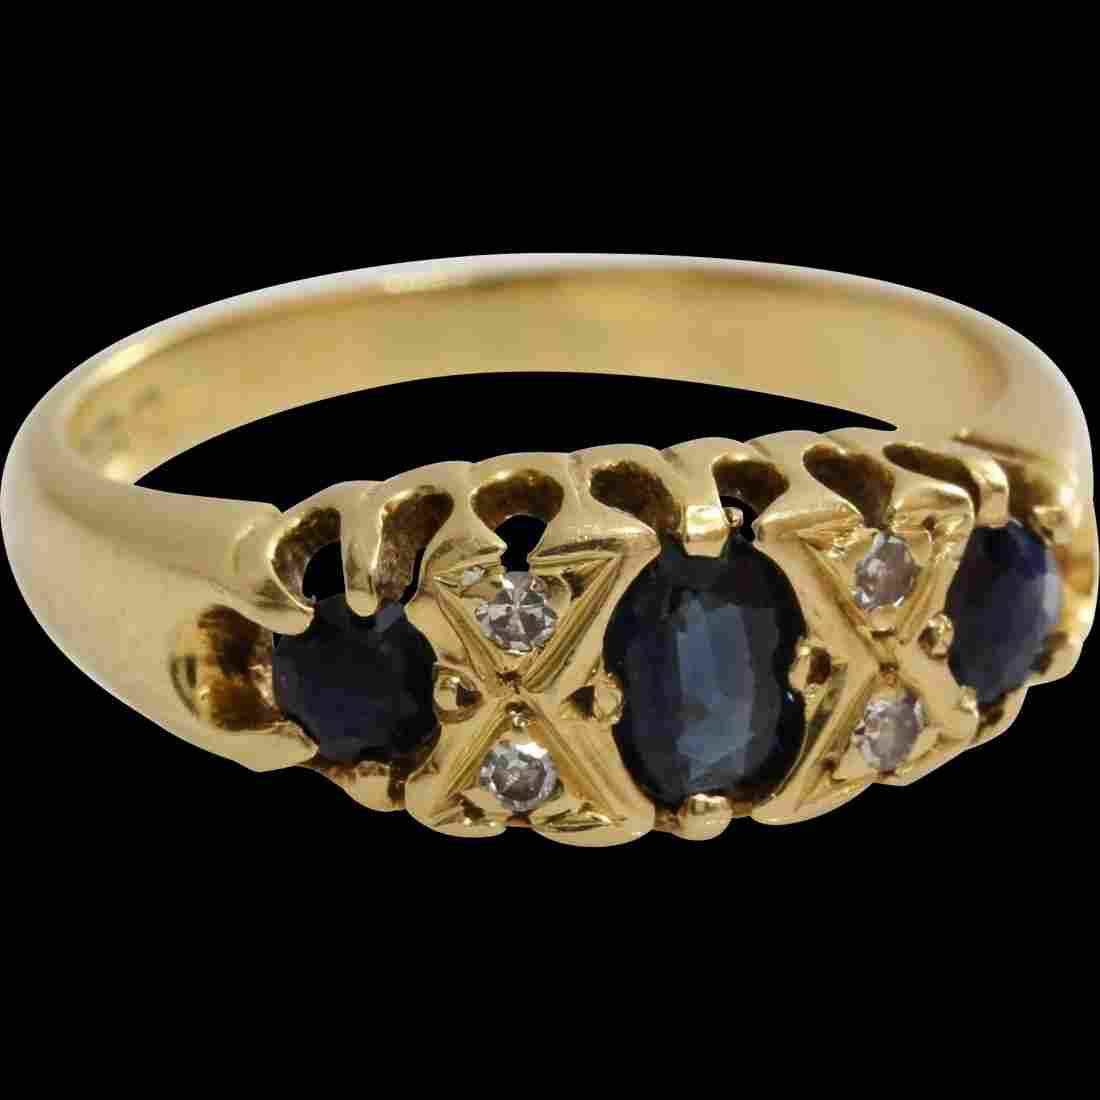 Edwardian Sapphire Diamond Ring   18K Yellow Gold  